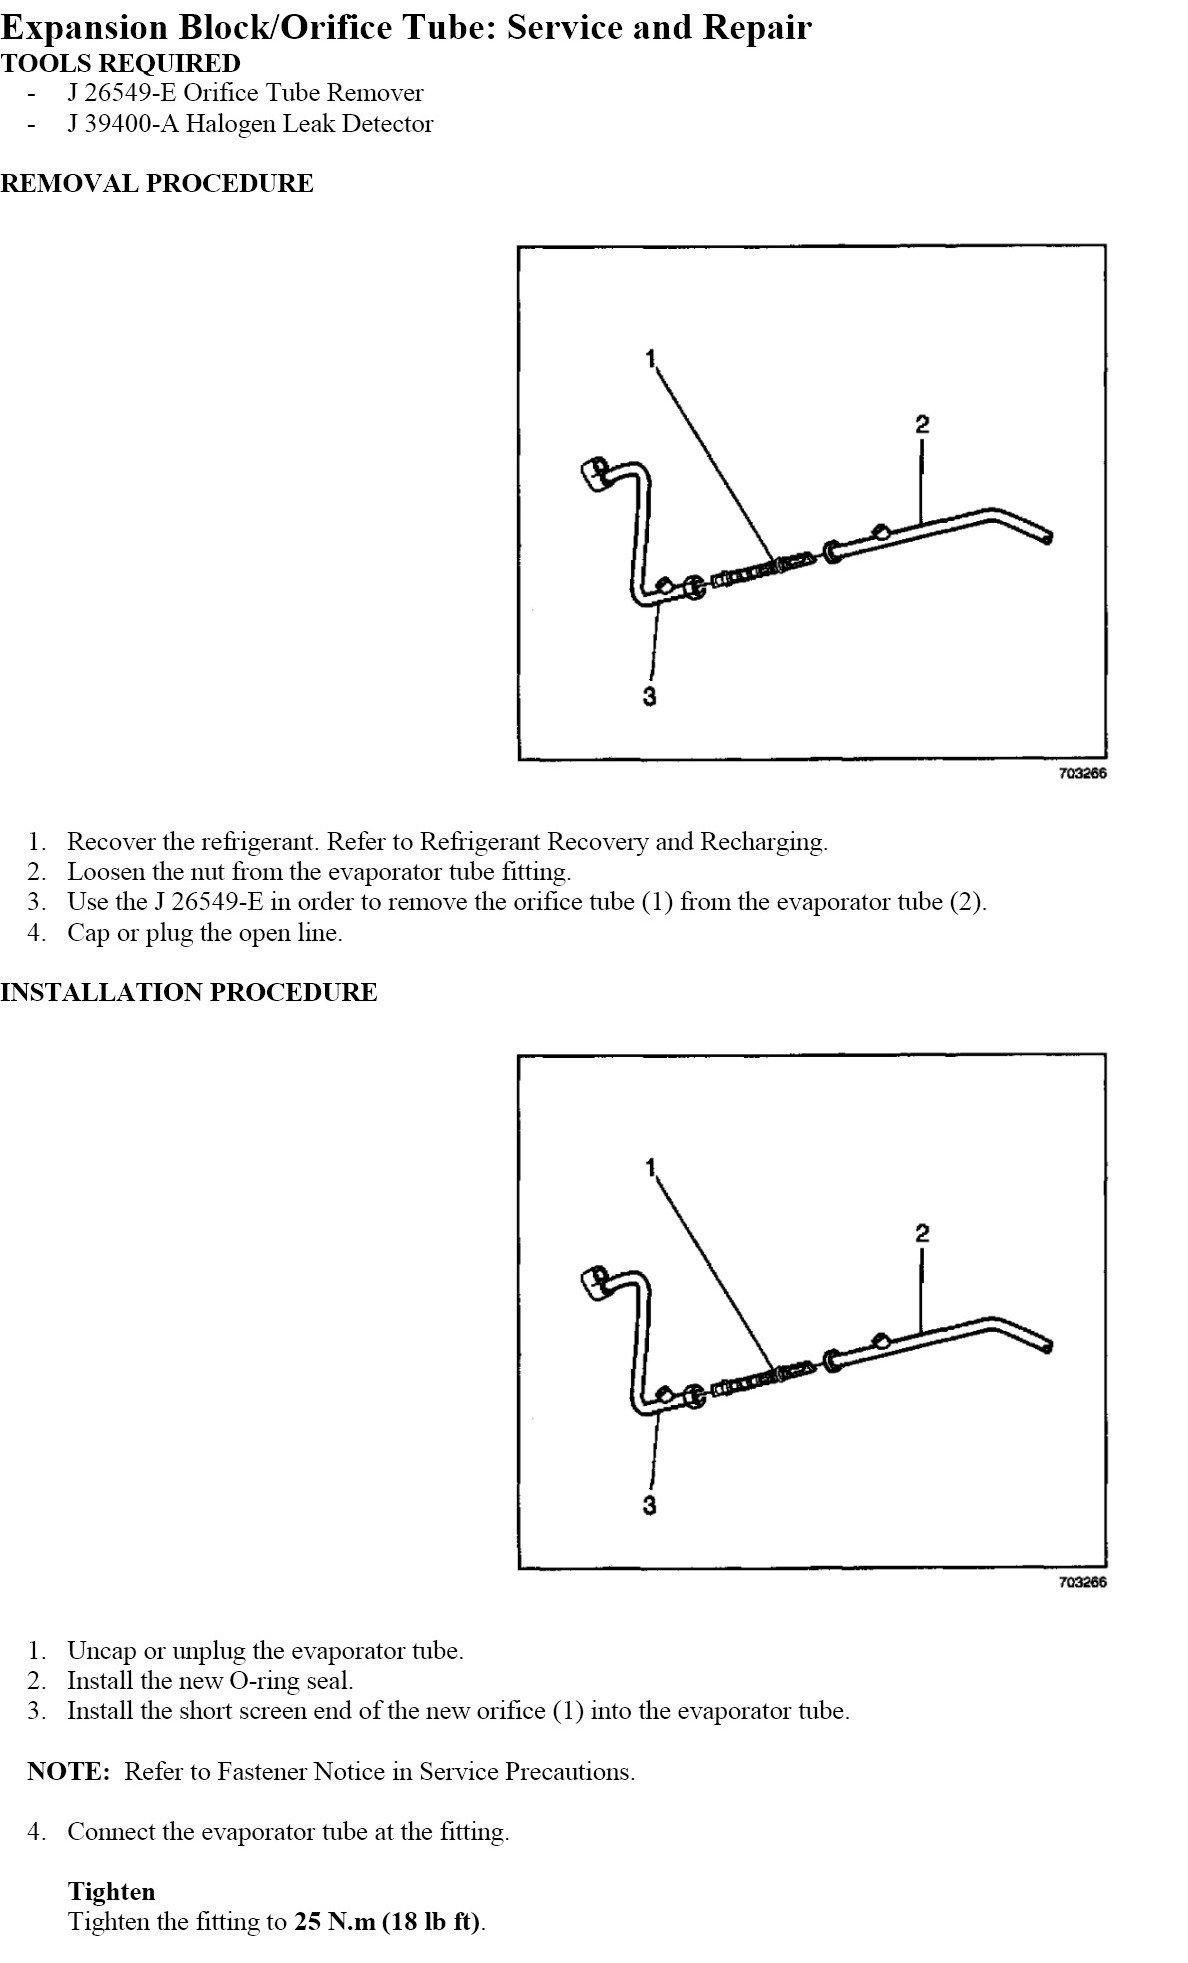 2002 Yukon Xl Need To Replace The Orifice Tube But Can't Find It. GMC. 2001 GMC Yukon Evaporator Diagram At Scoala.co